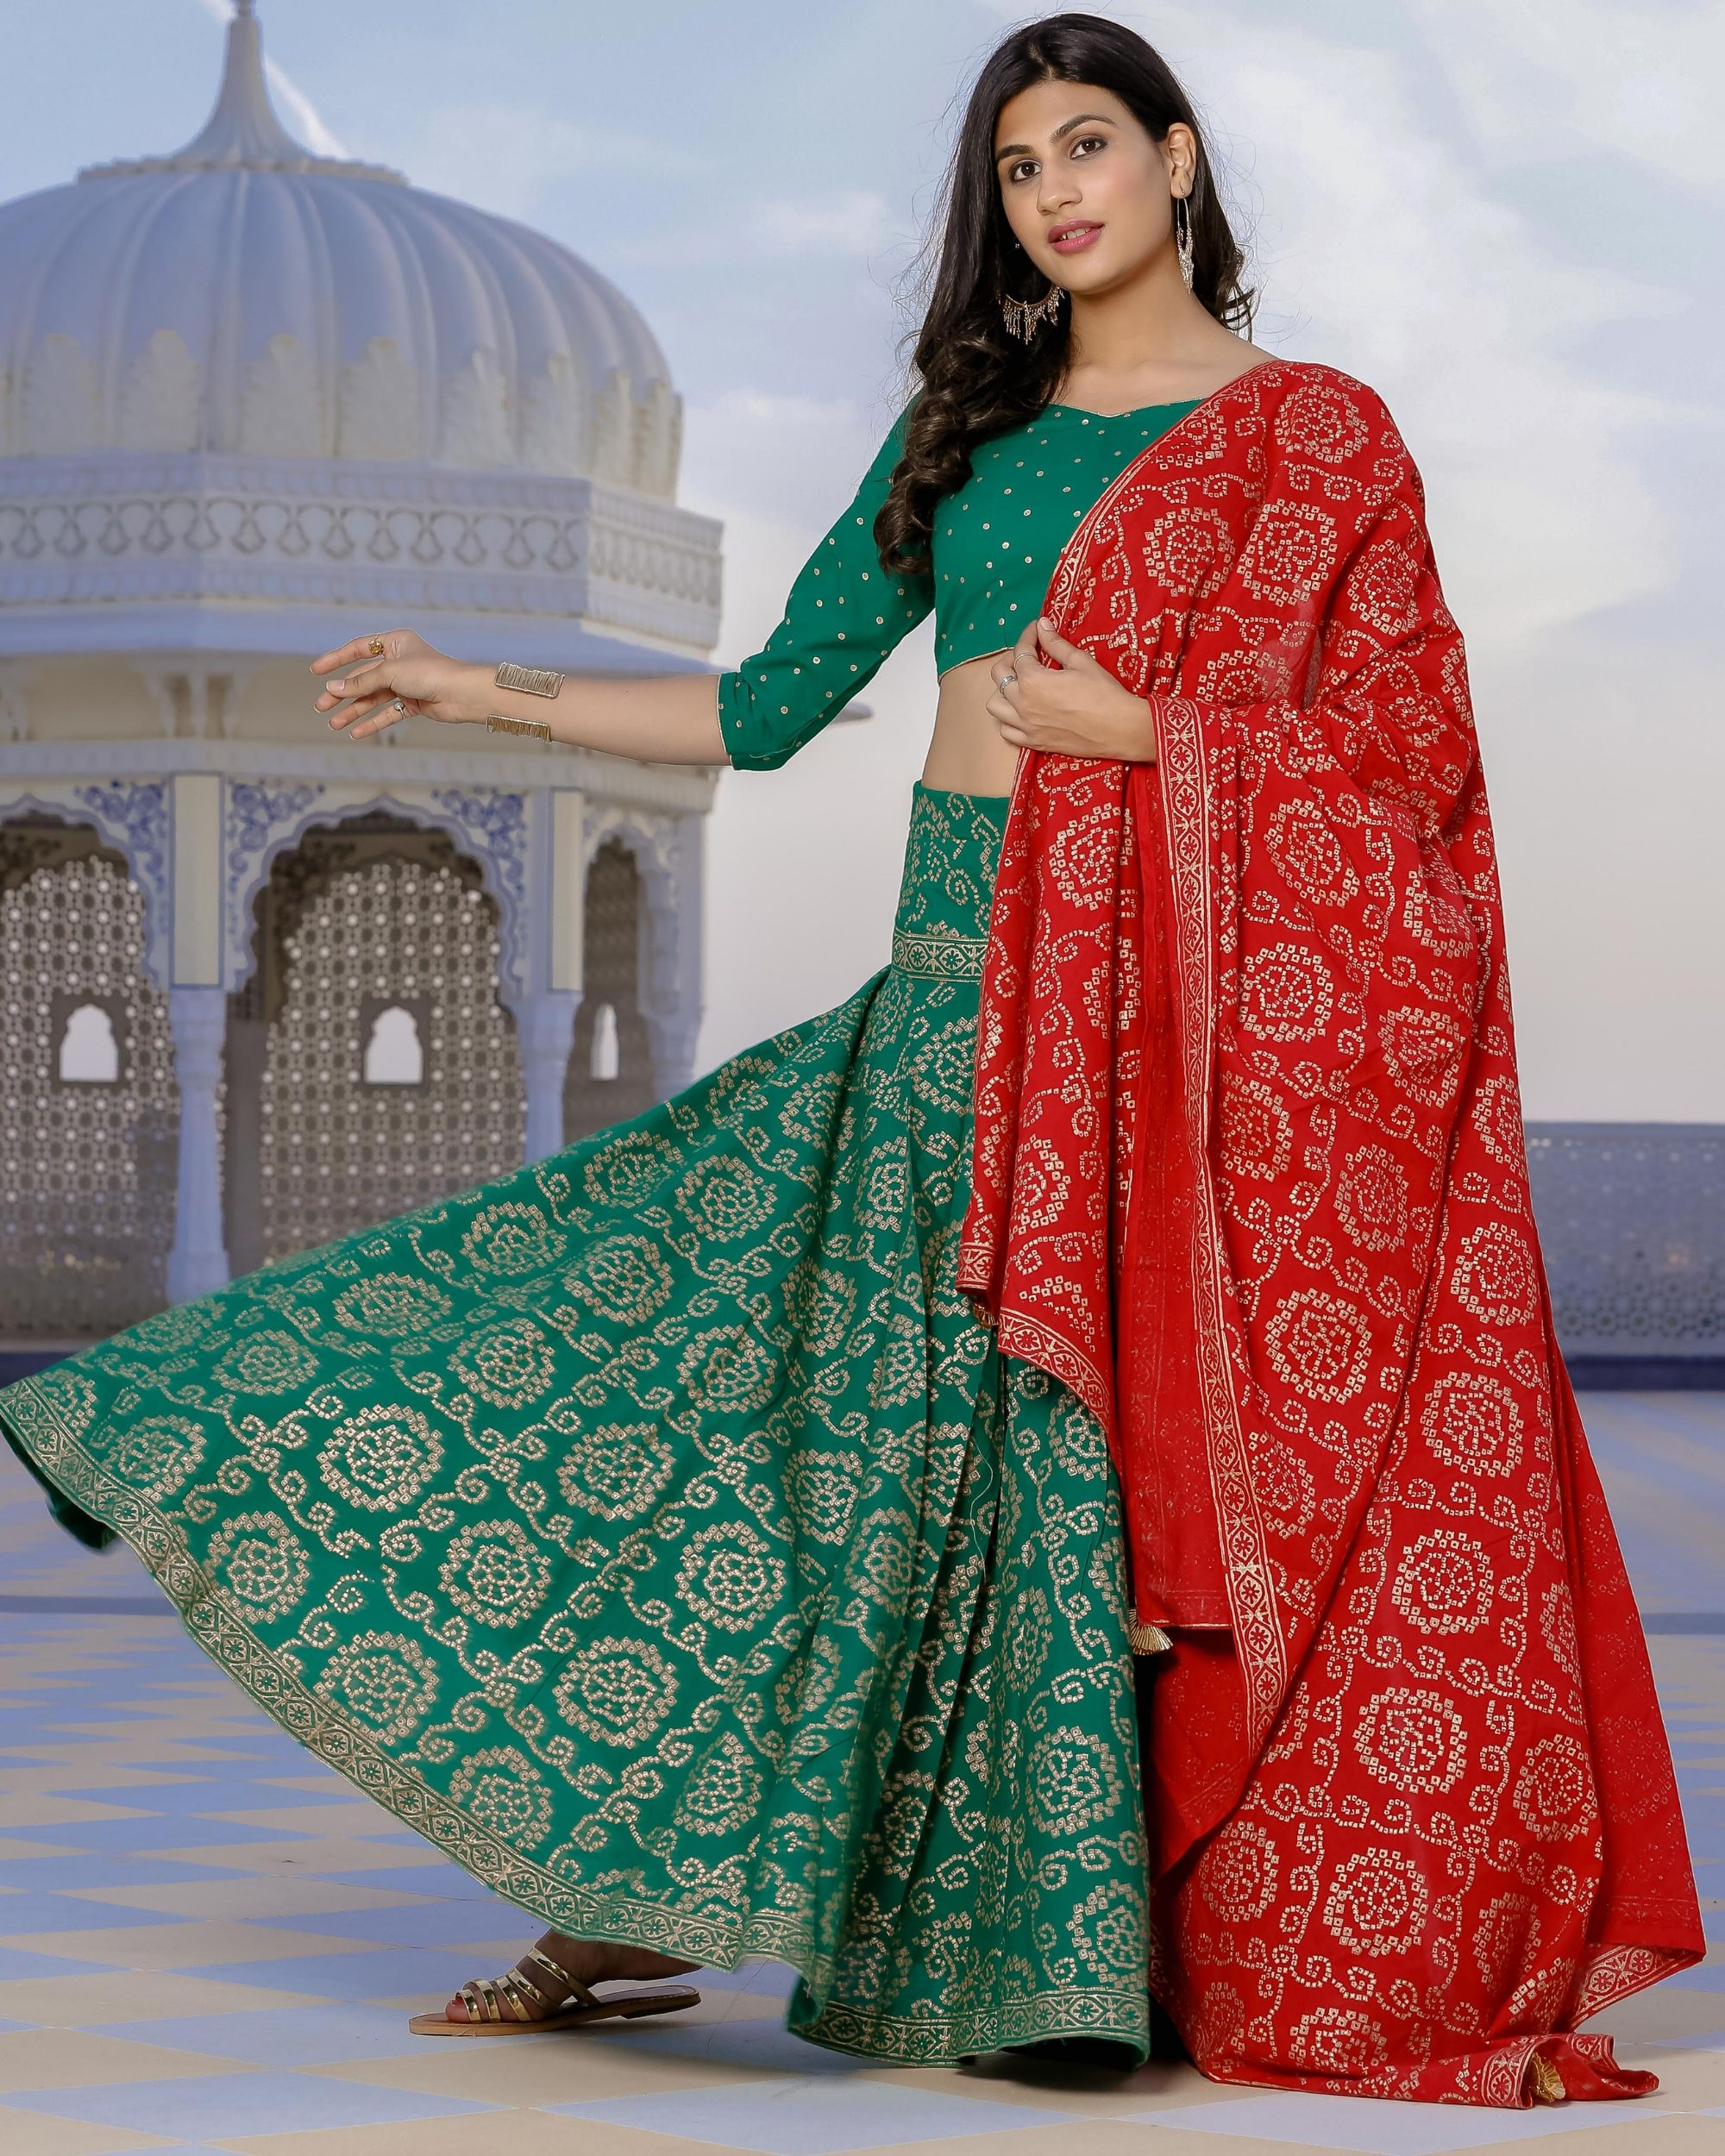 Red and green bandhani lehenga set- set of three